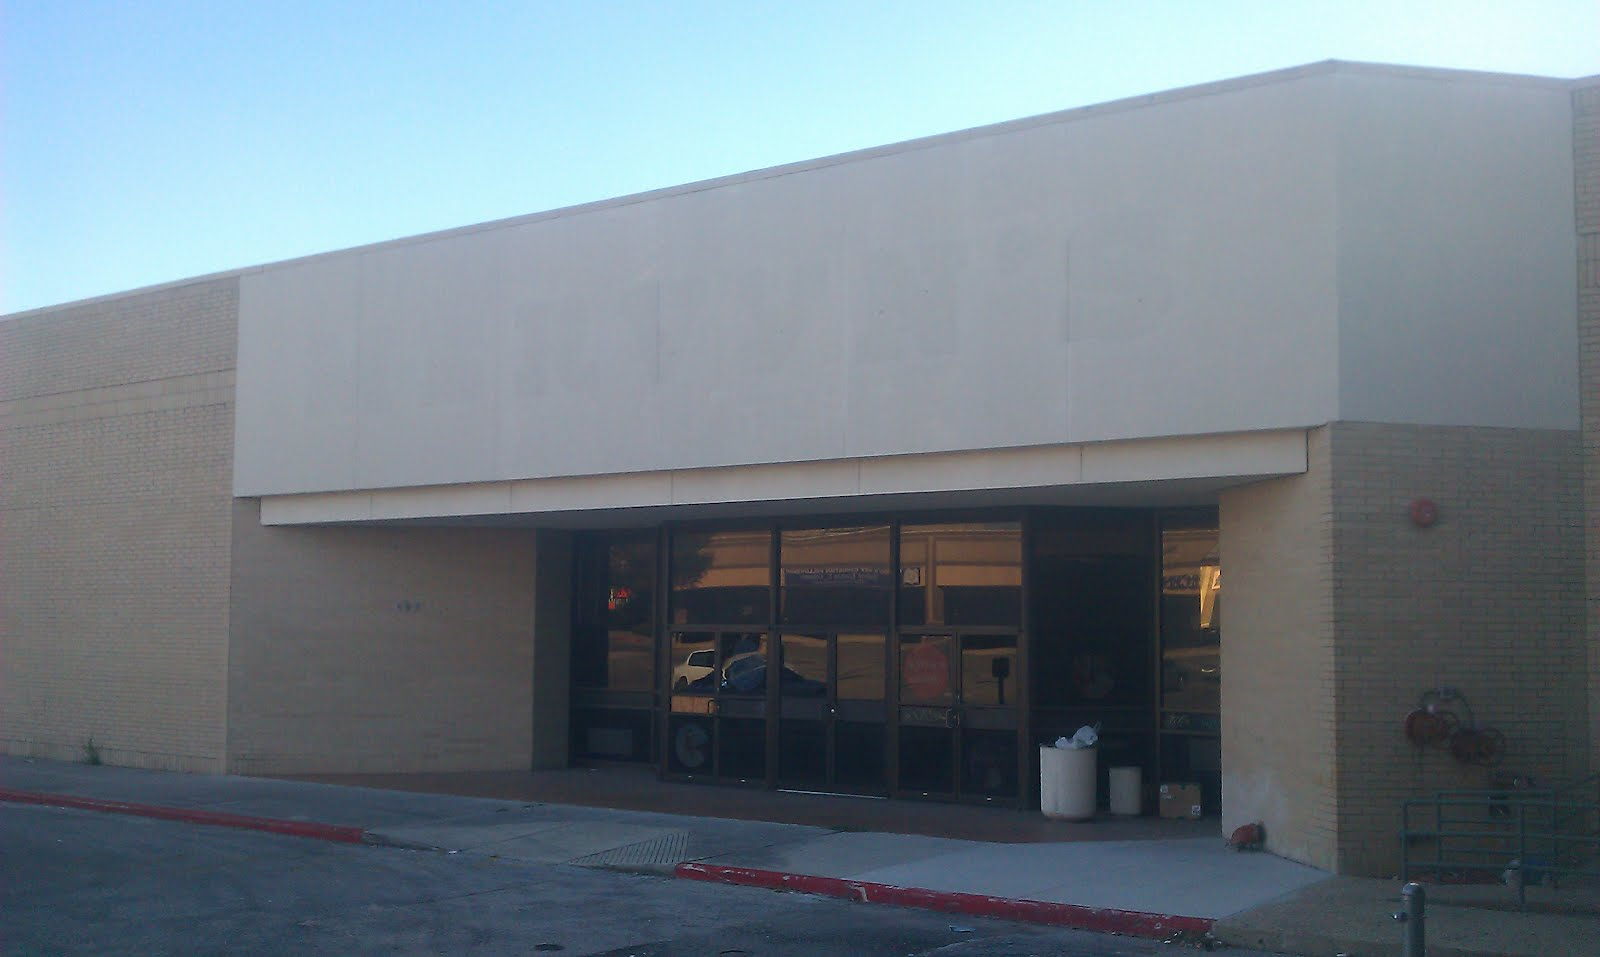 Oakley Store Ingram Park Mall | Louisiana Bucket Brigade